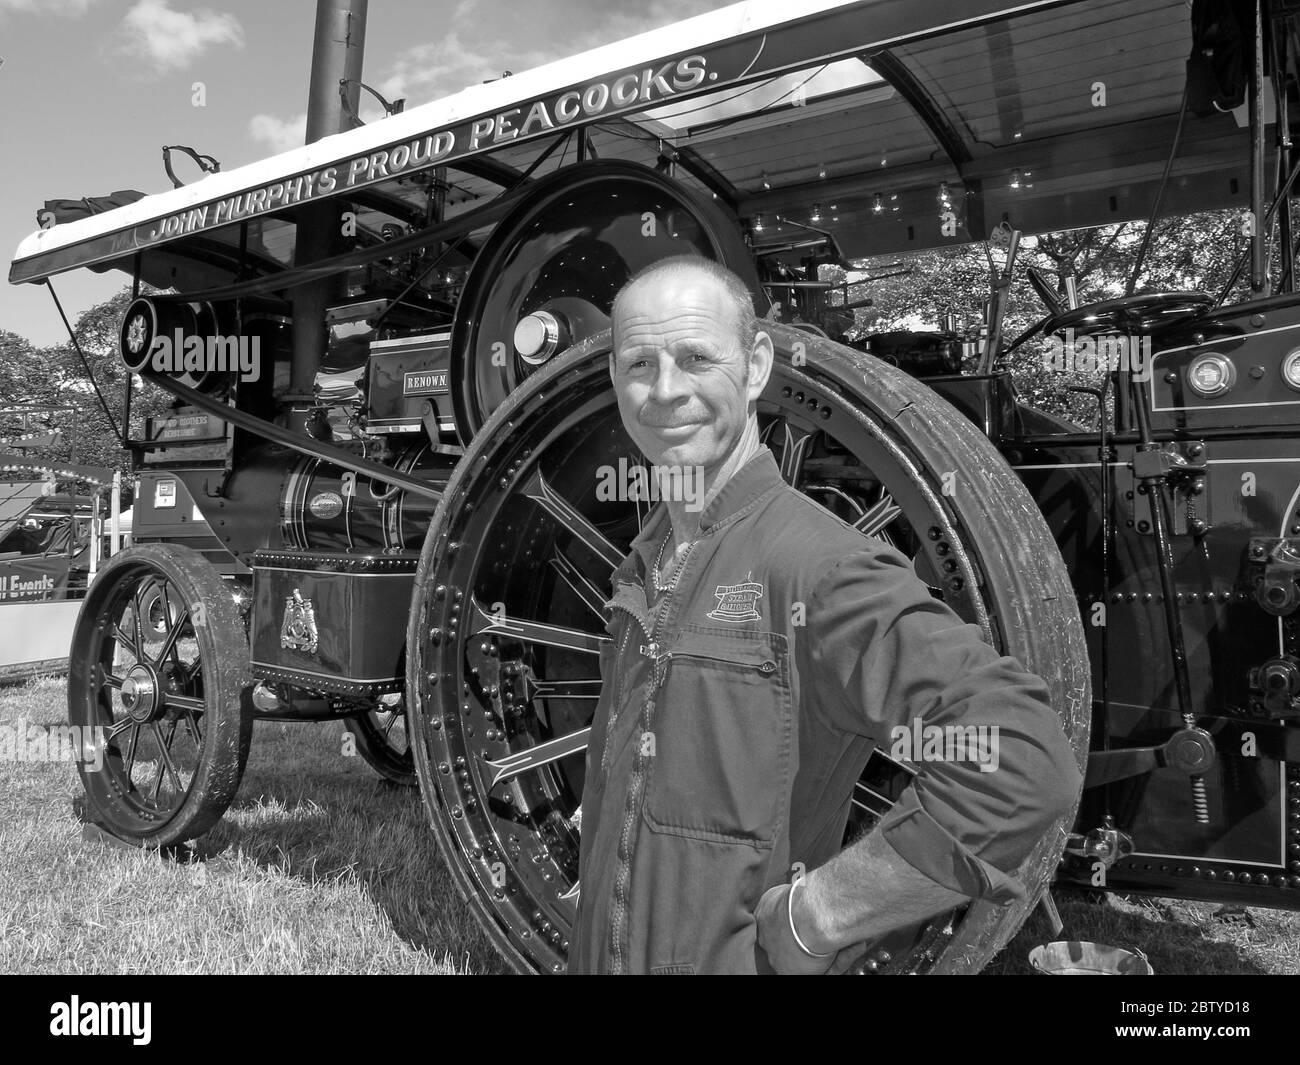 HotpixUk,@HotpixUK,GoTonySmith,BW,man,people,men,engineers,hunks,history,historic,British,GB,Great Britain,John Murphys,proud Peacocks,Renown,operator,Leicestershire,England UK,steam,traction,engine,showman,showmans,steam heritage,heritage